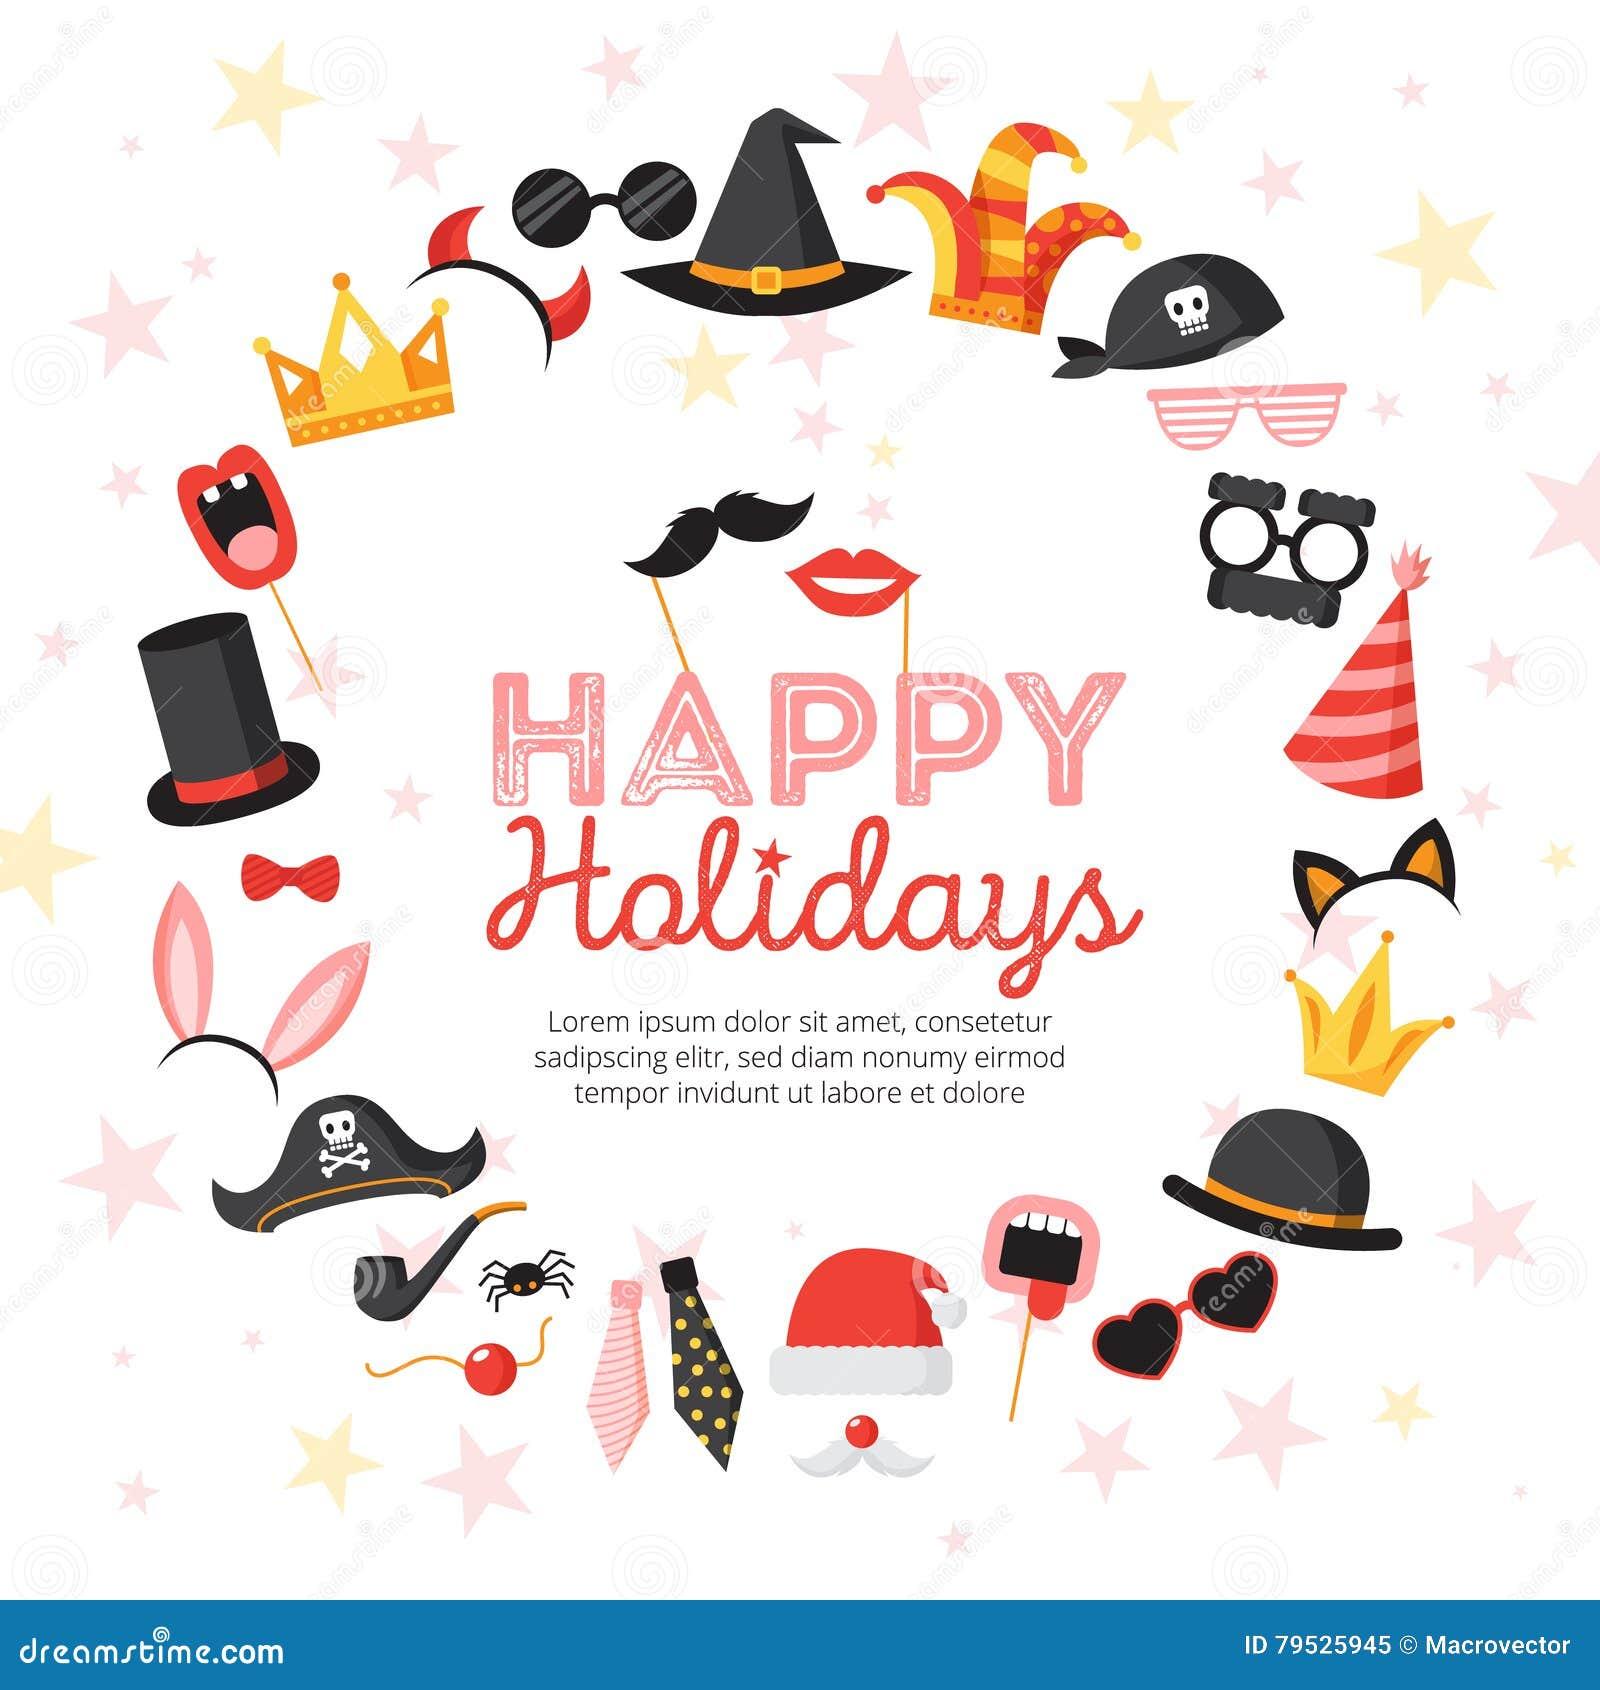 Authoritative message happy holidays ellie facial